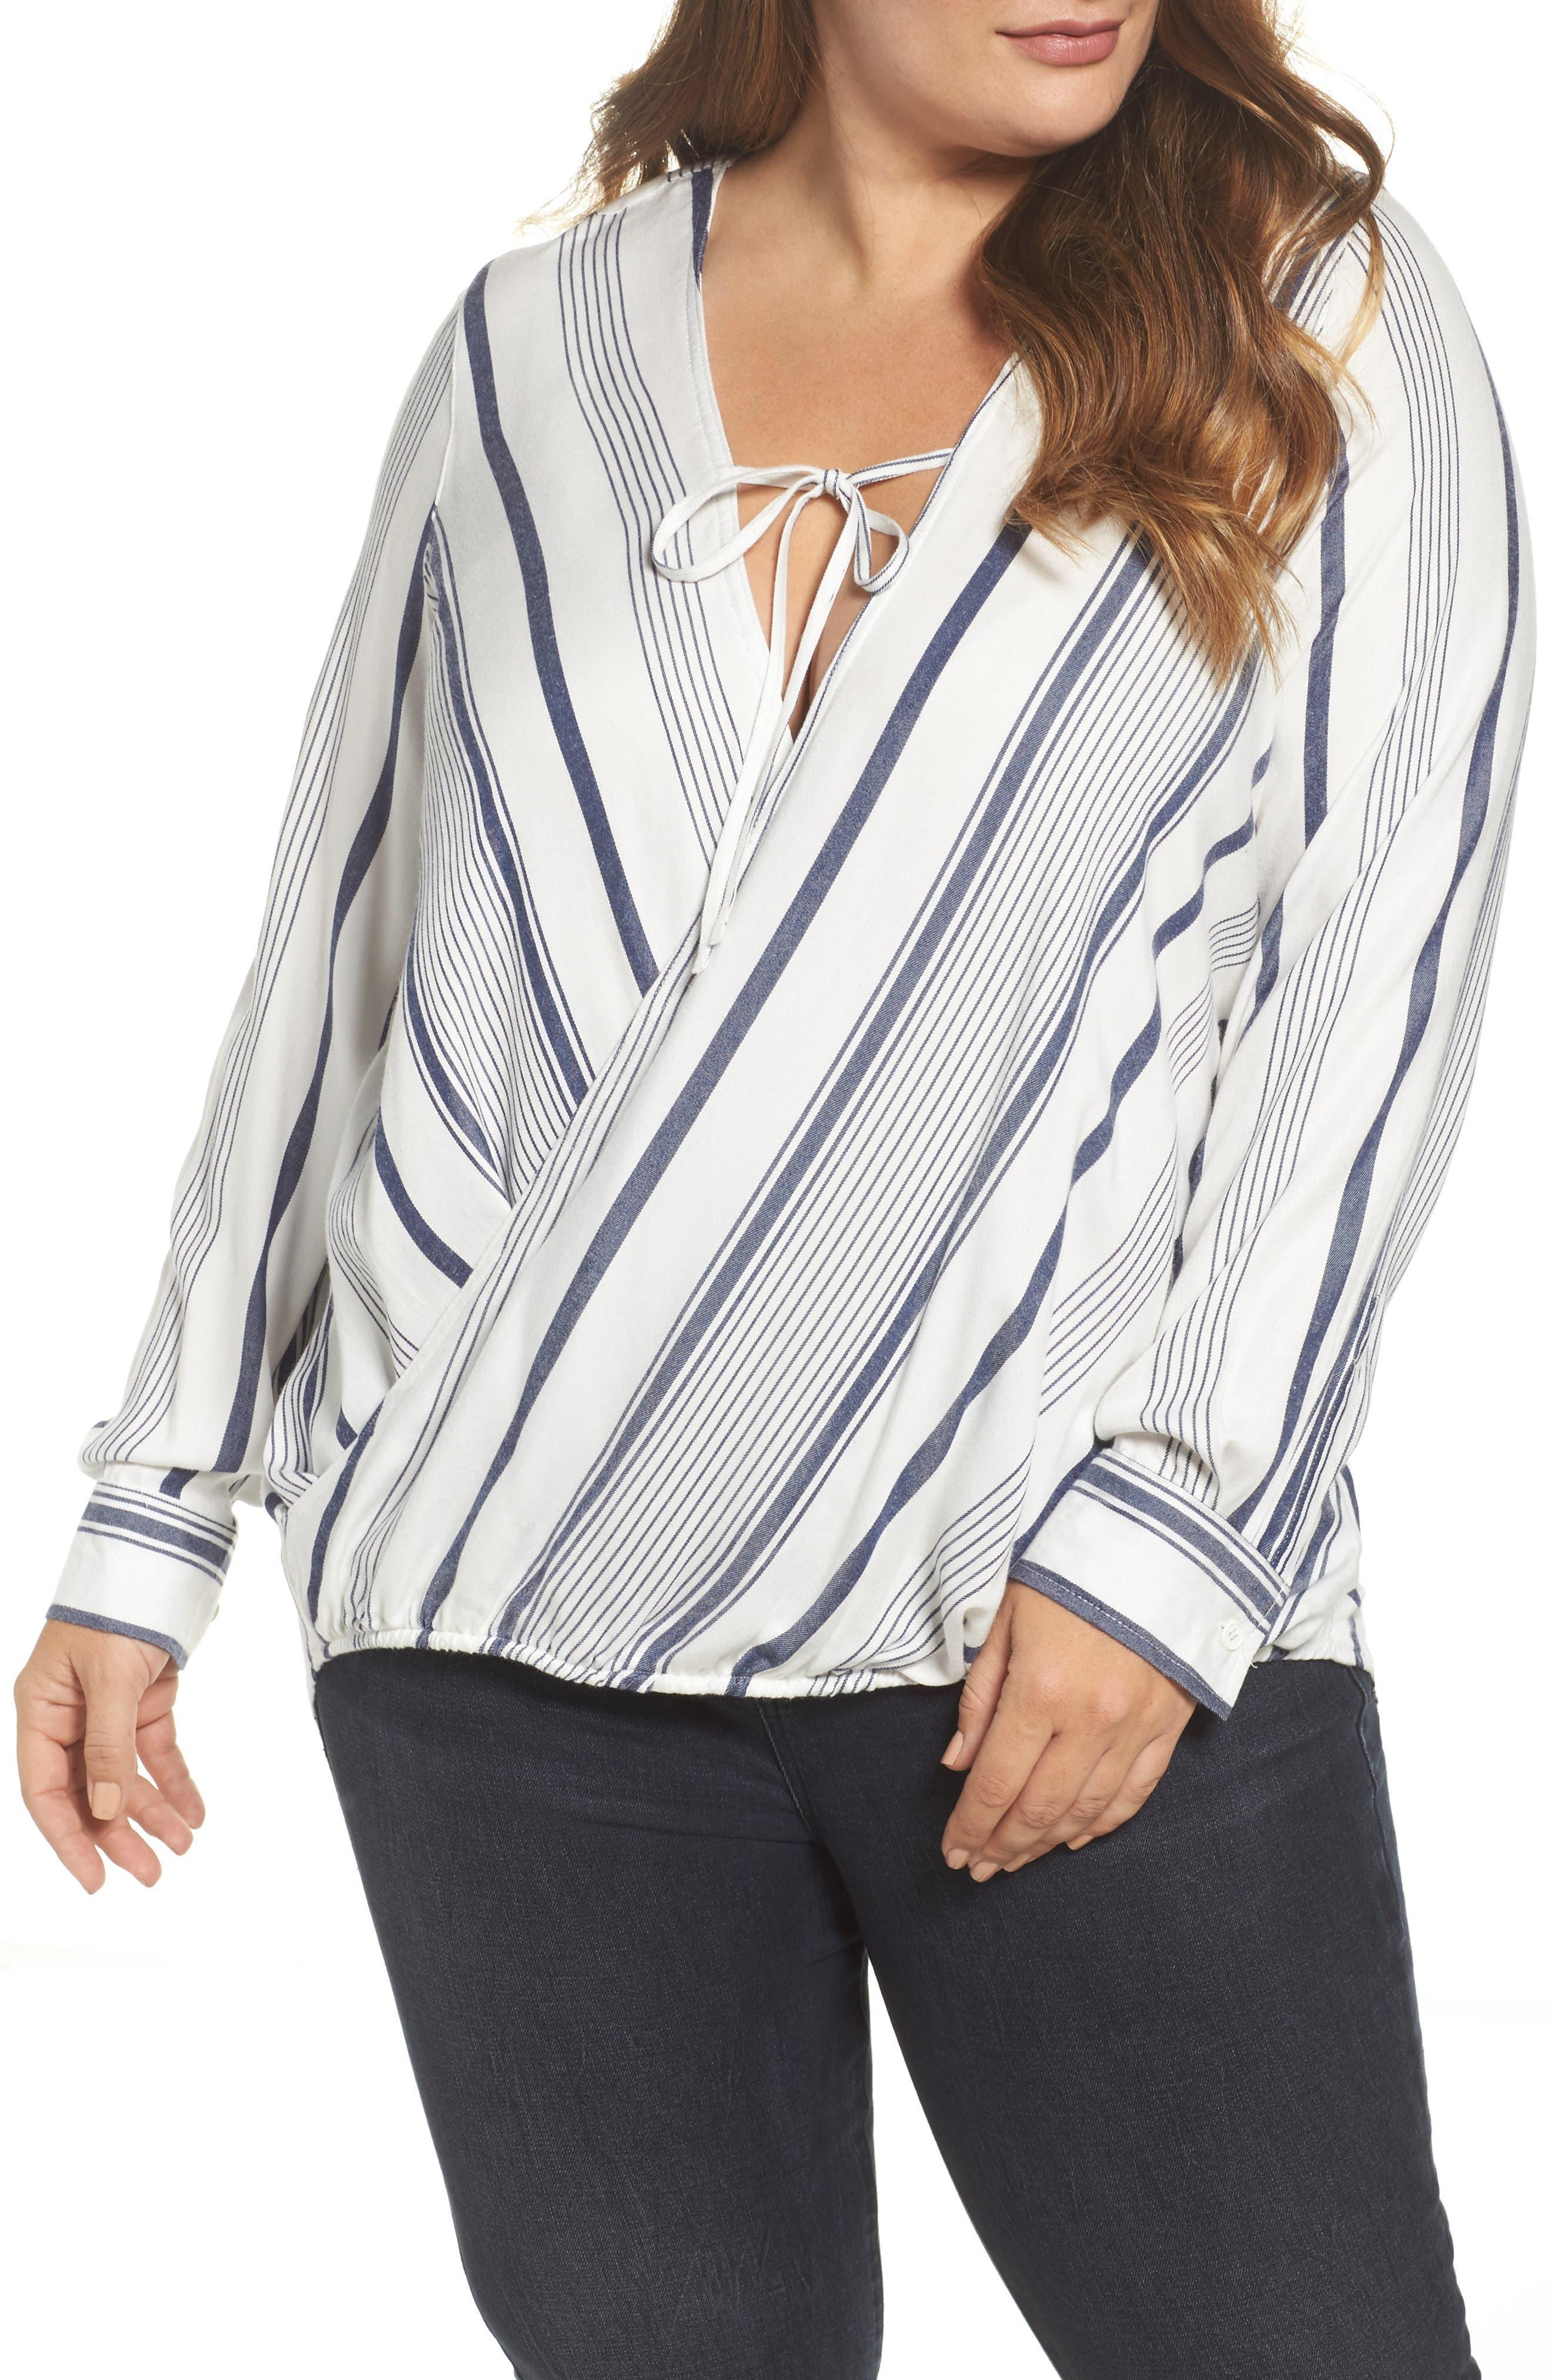 Main Image - Melissa McCarthy Seven7 Stripe Surplice Top (Plus Size)